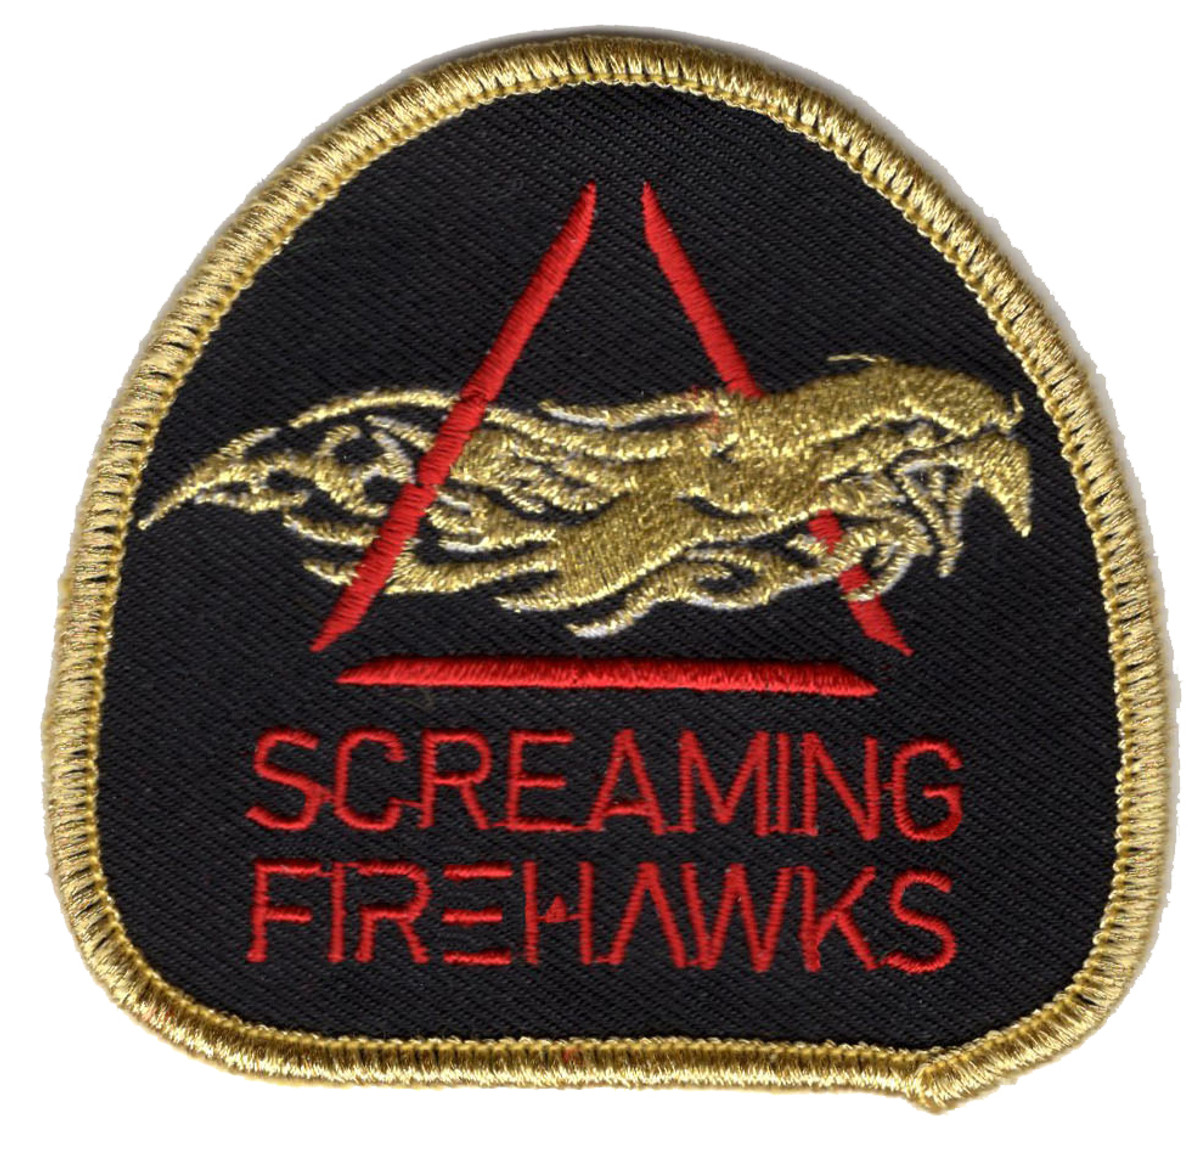 Screaming Firehawks Patch